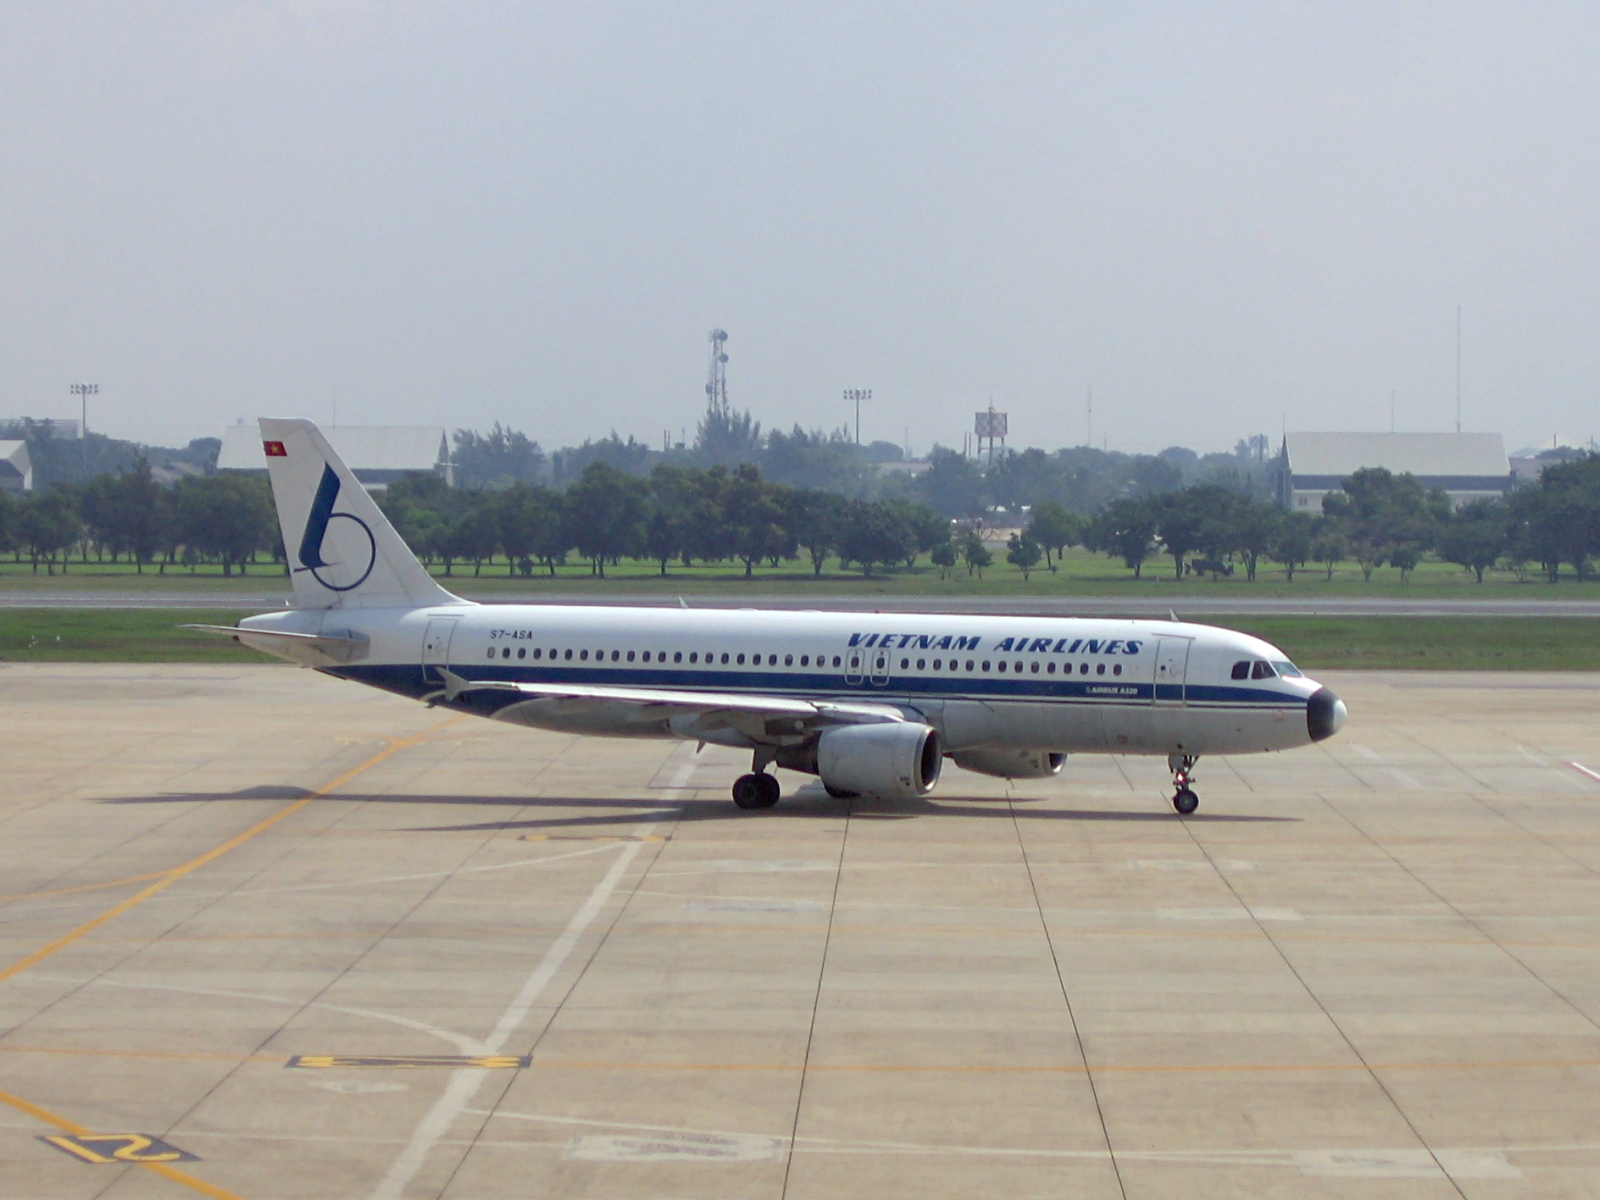 Vietnam Airlines Wikimedia Commons